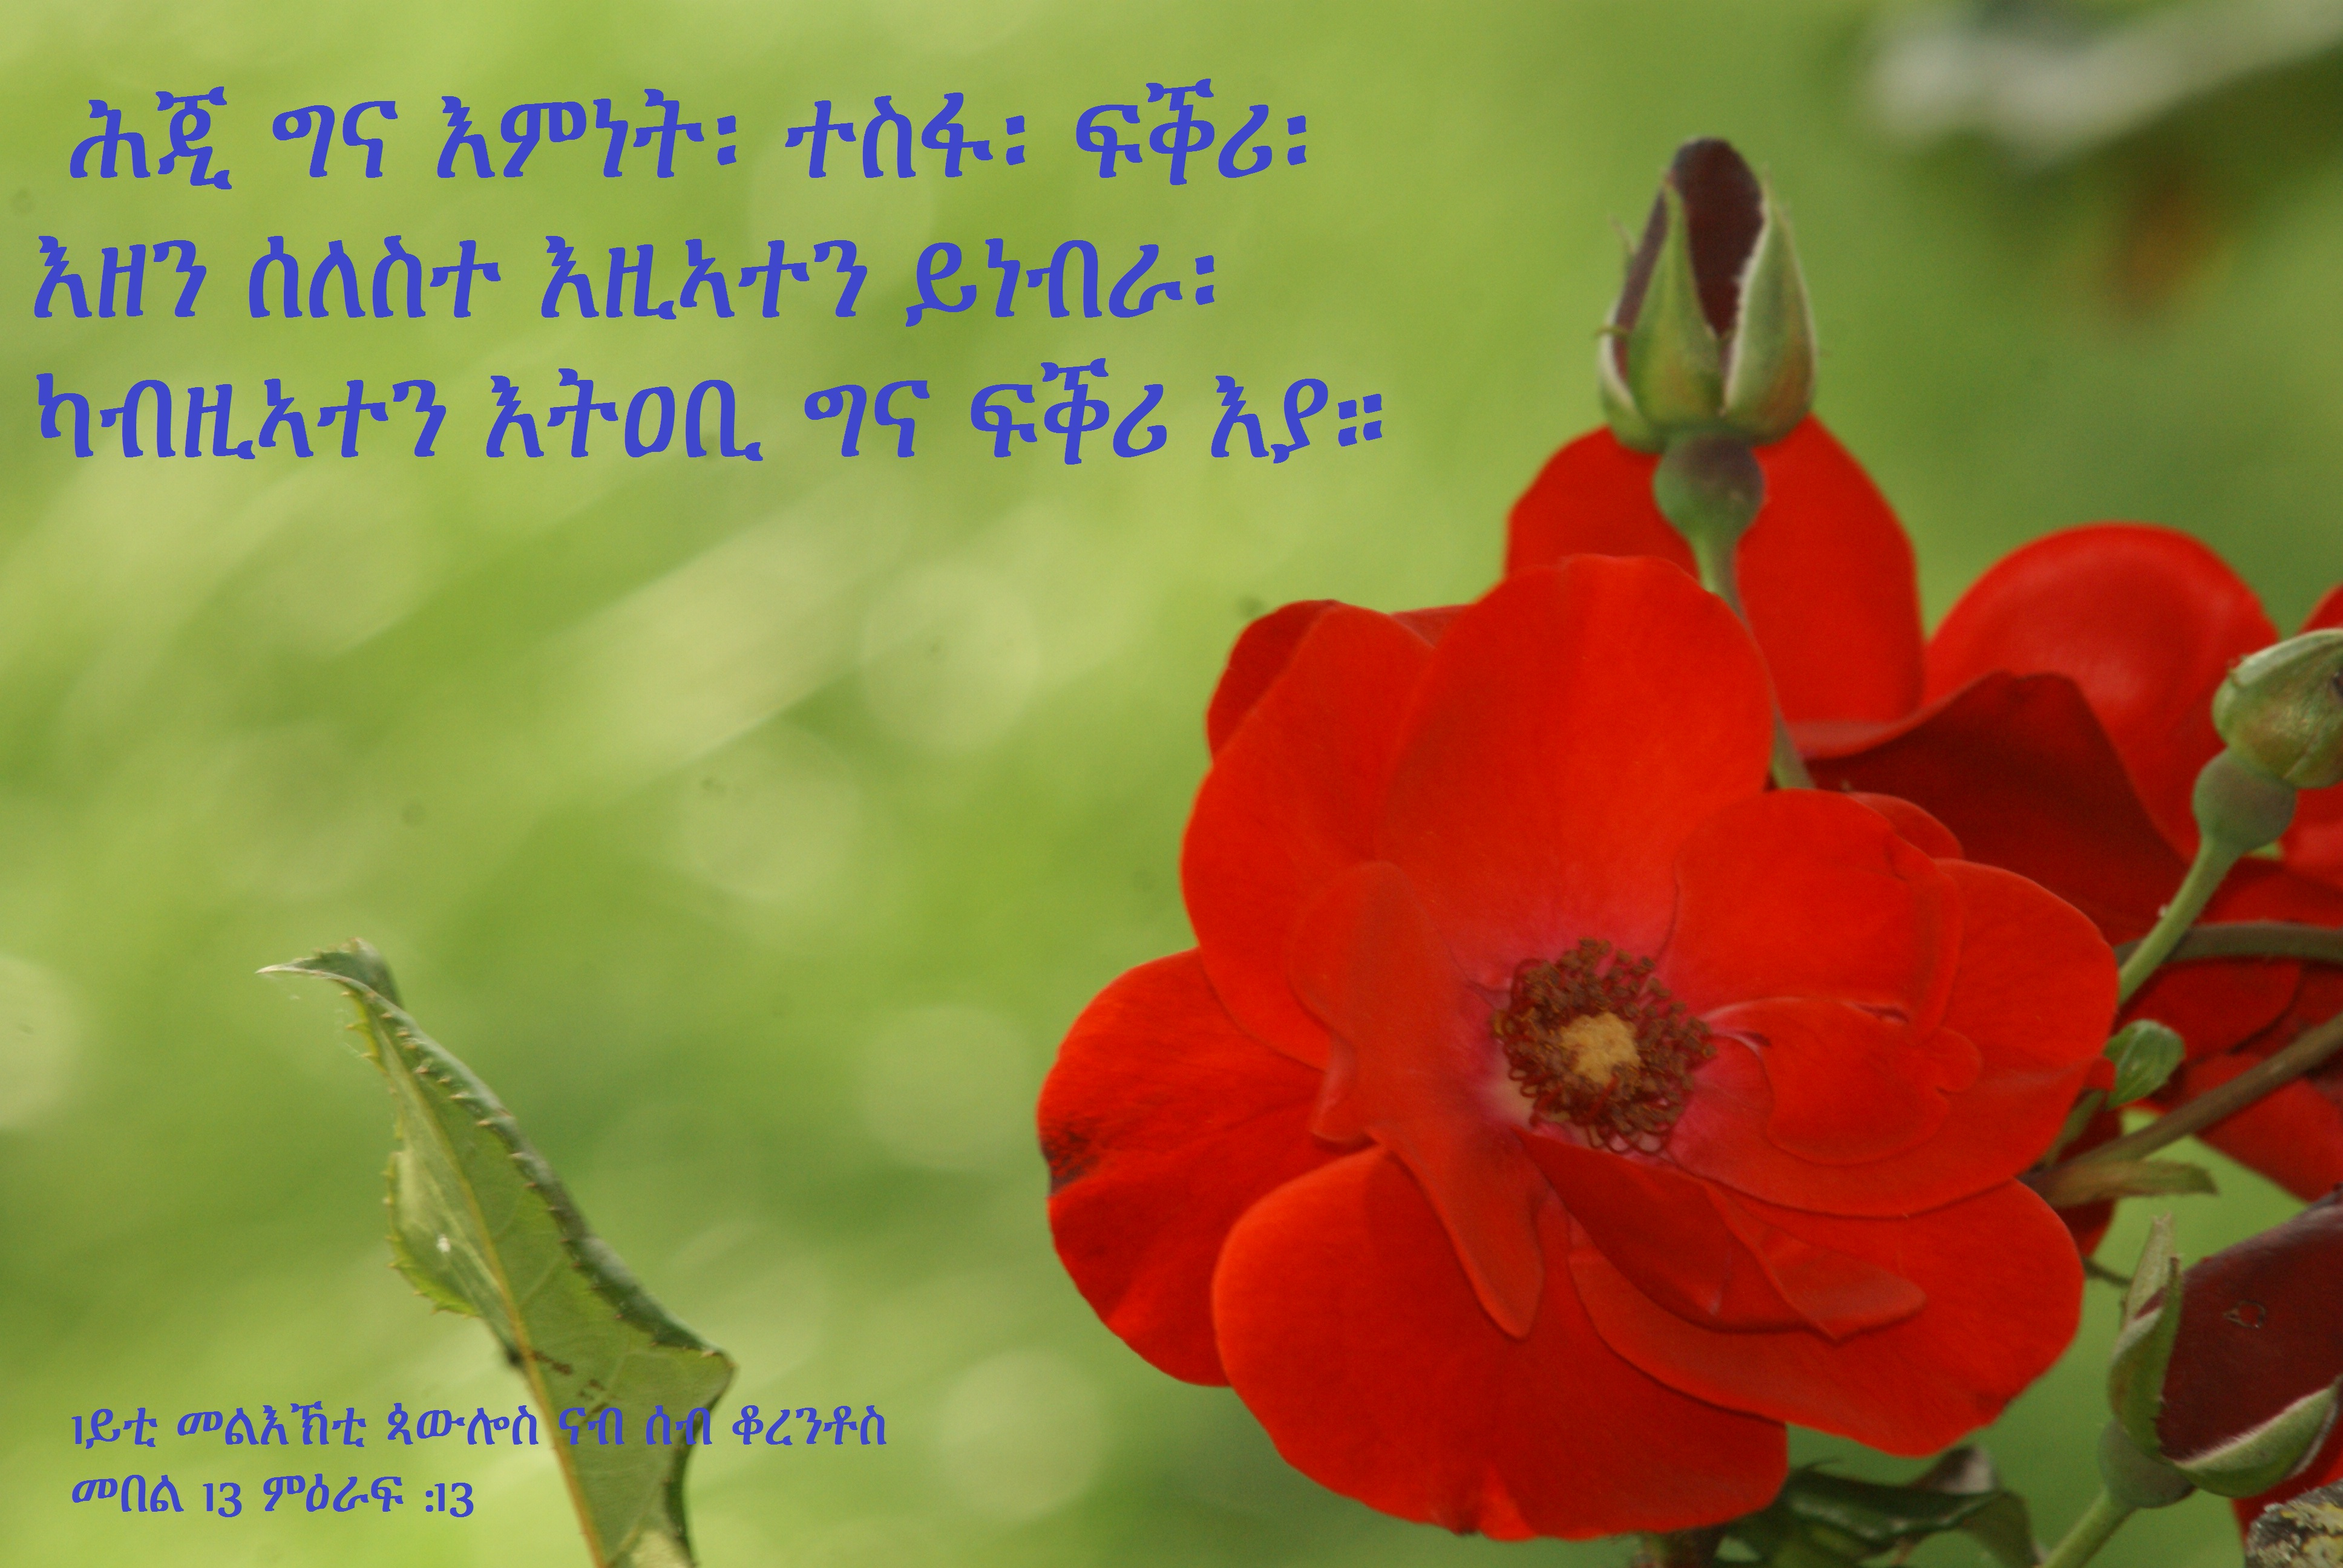 File:eritrean bible verses (12). Jpg wikimedia commons.